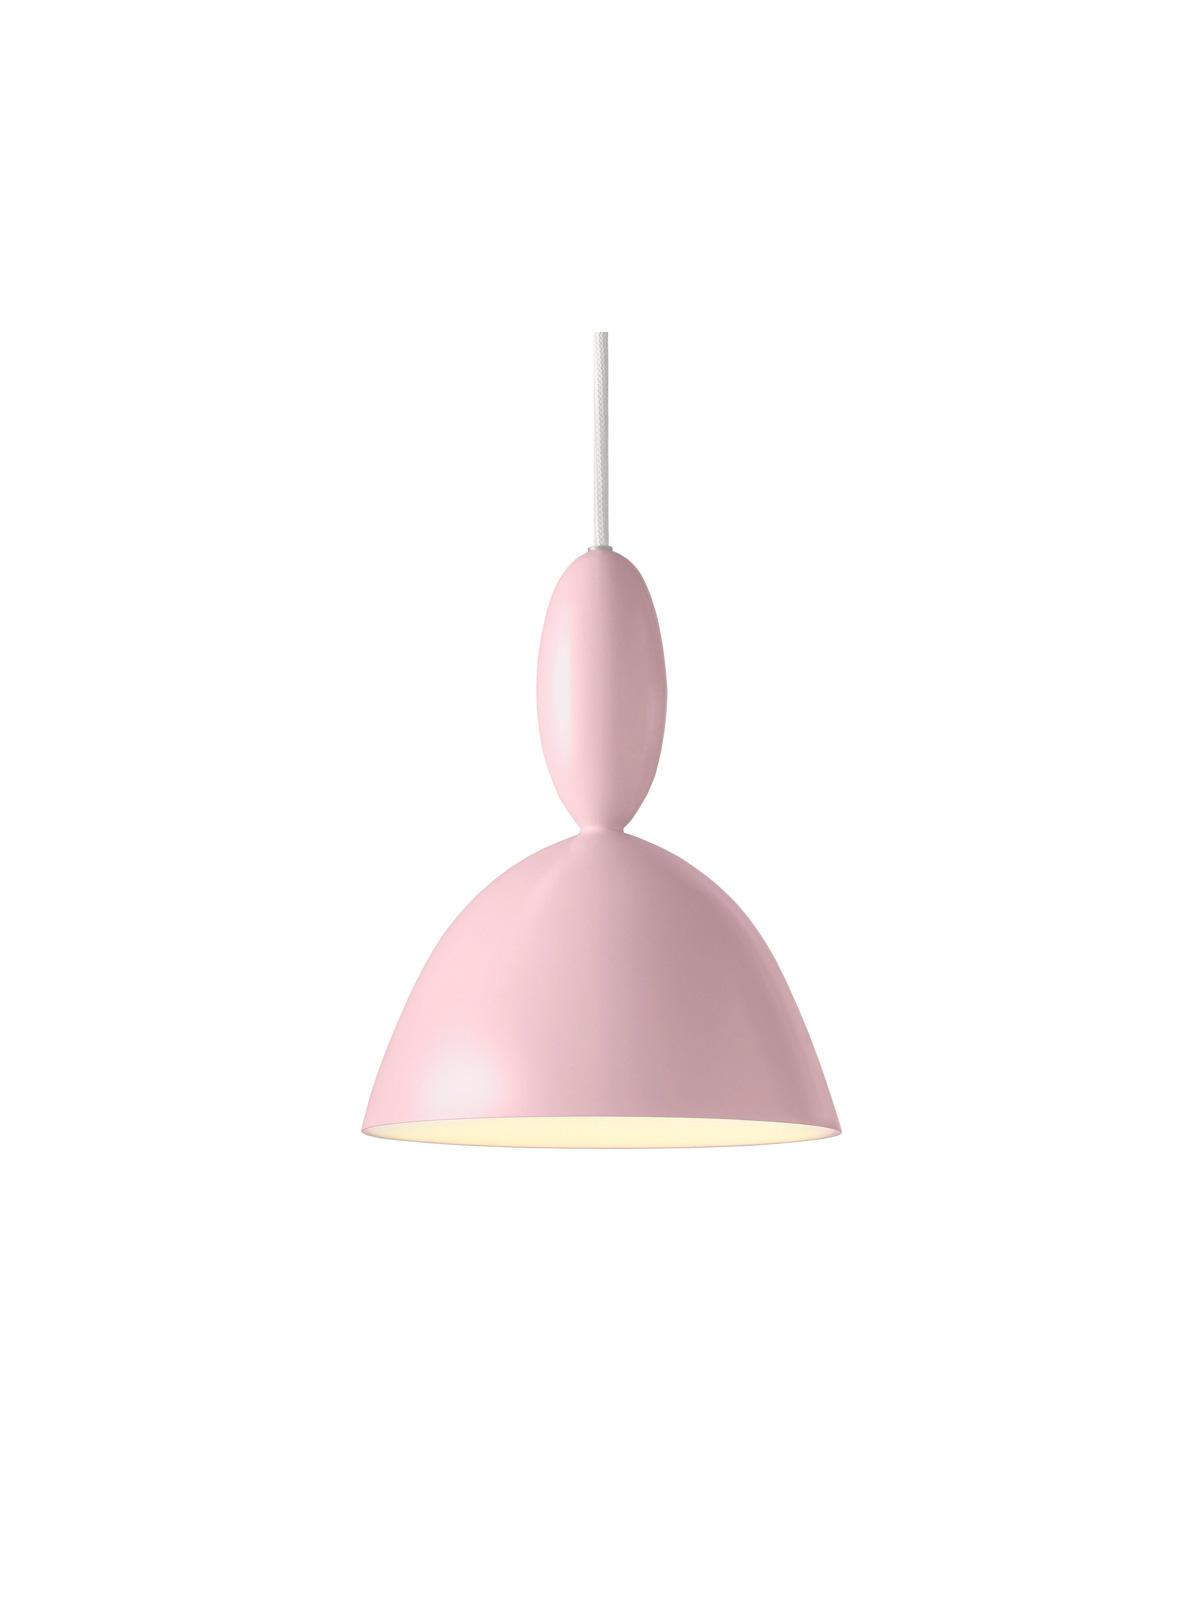 Pendelleuchte Mhy Pendant Lamp in Rose